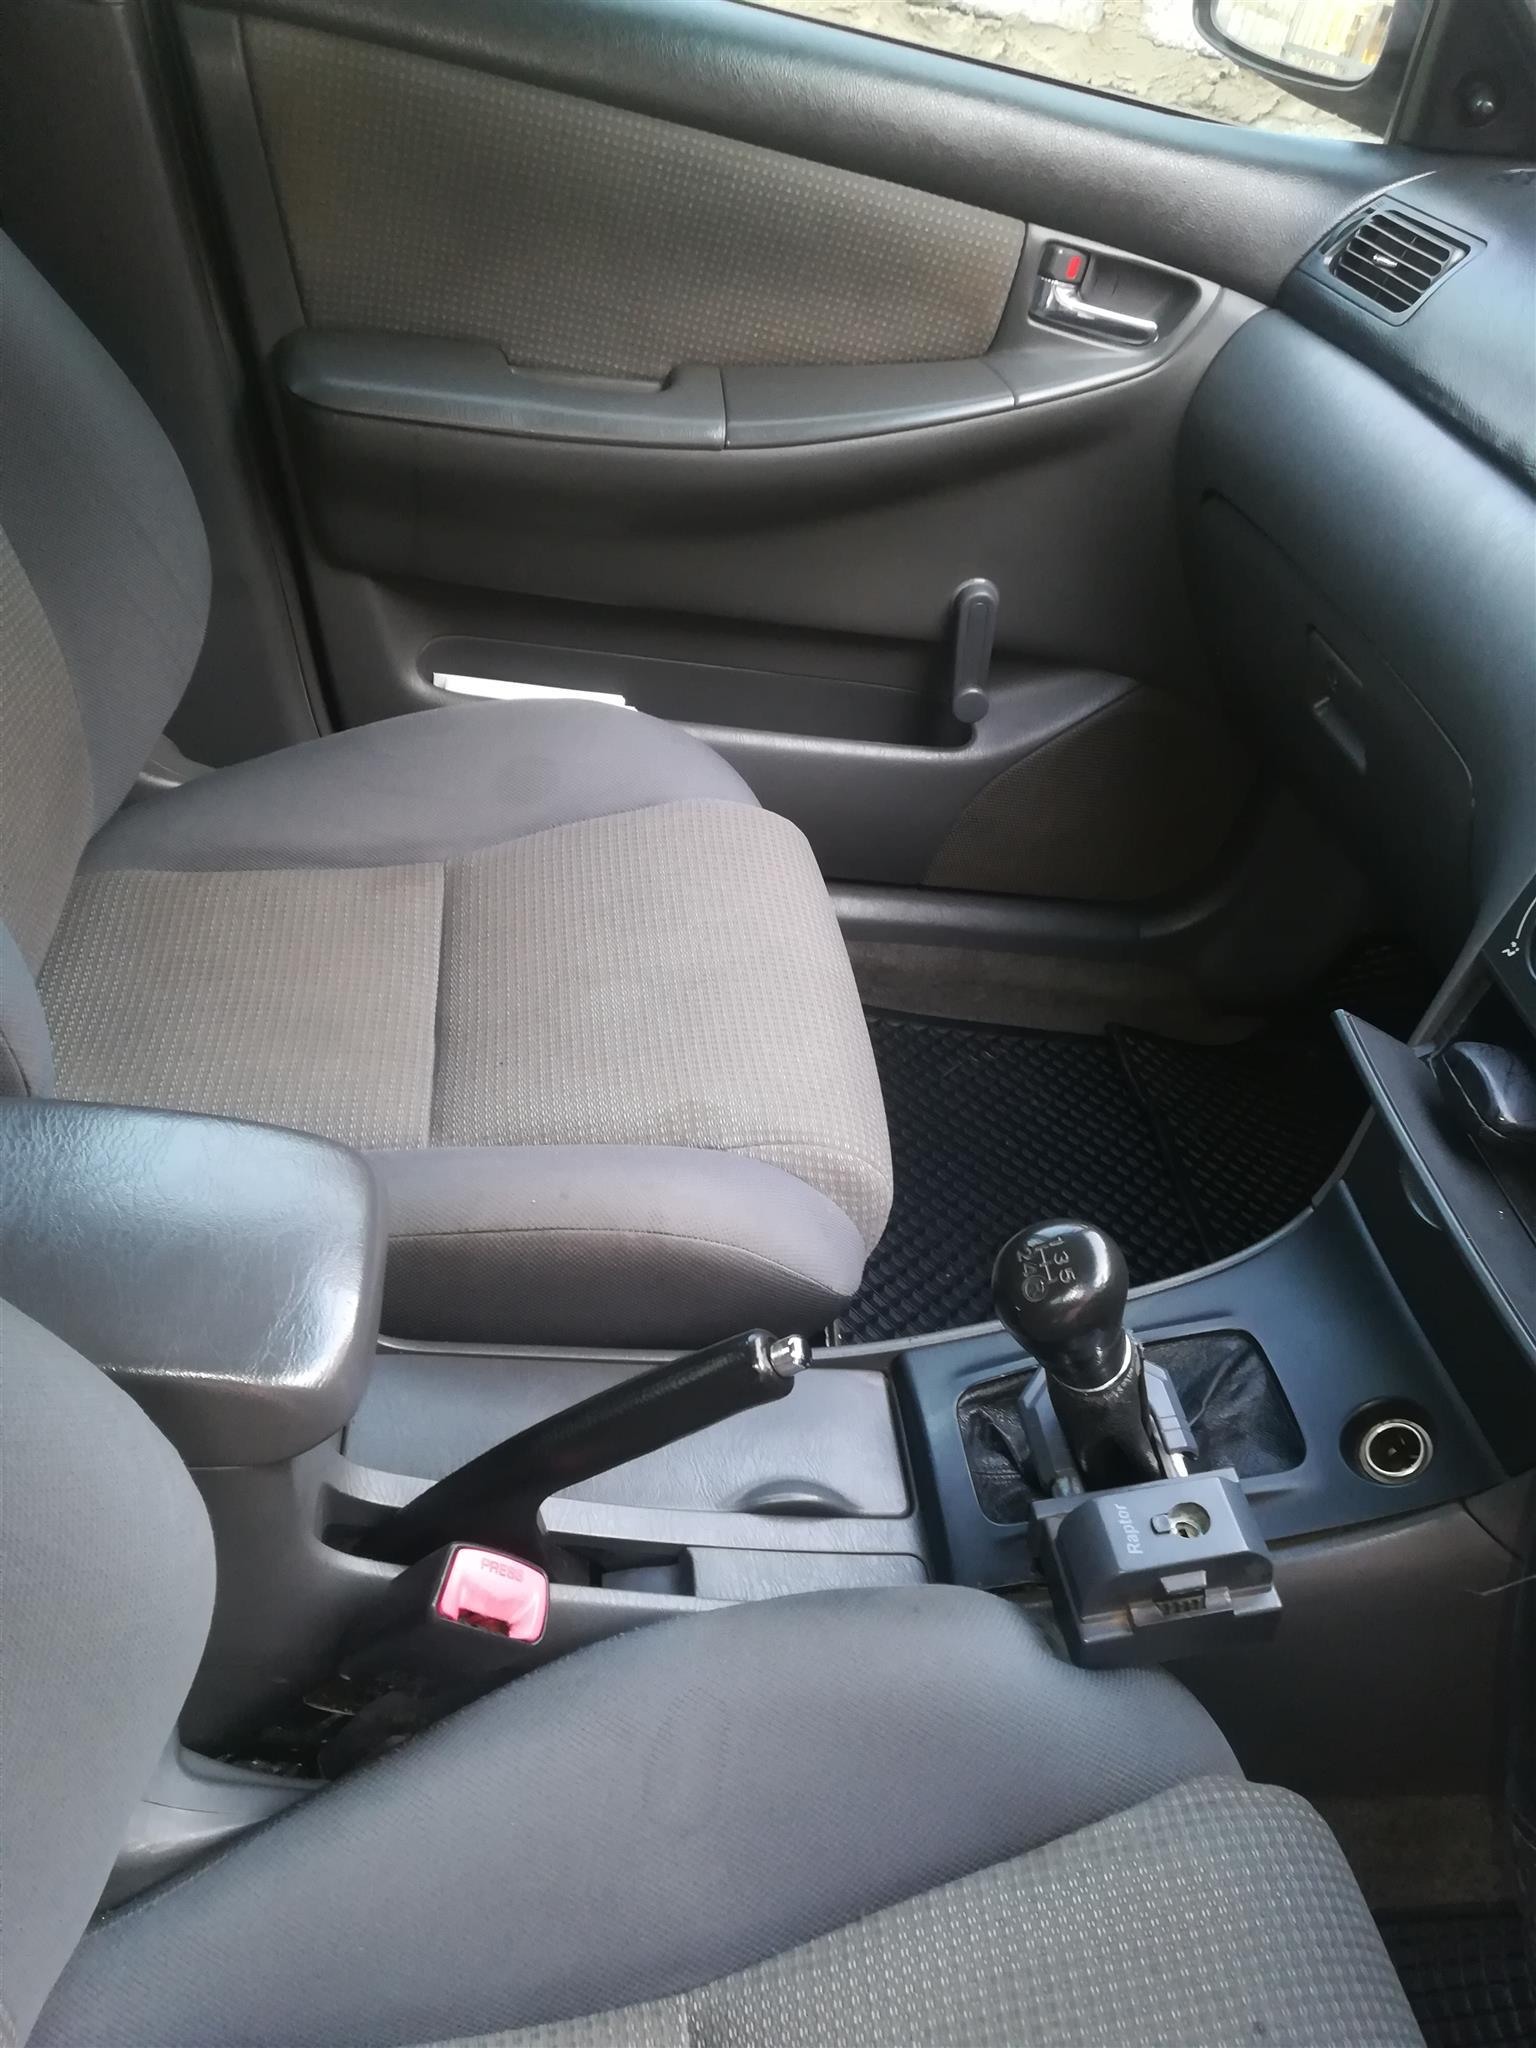 2005 Toyota Corolla 160i GLE